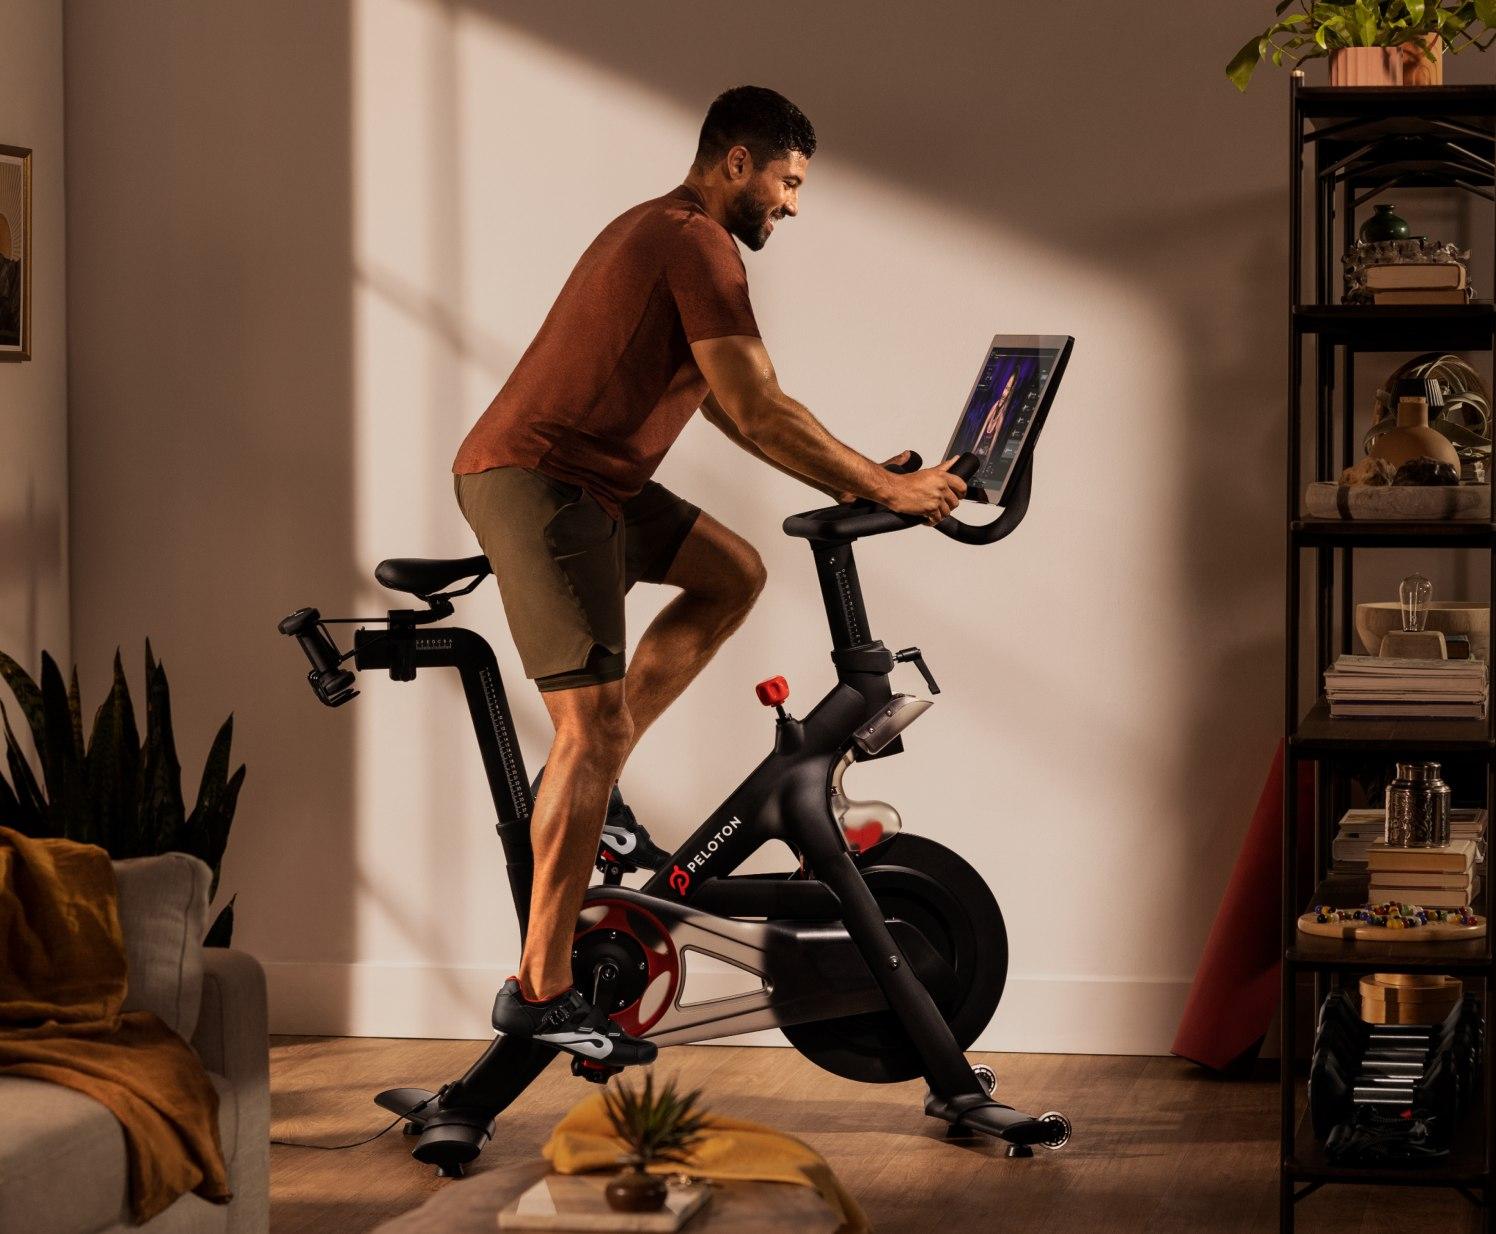 A Peloton customer enjoying the Bike in their home.